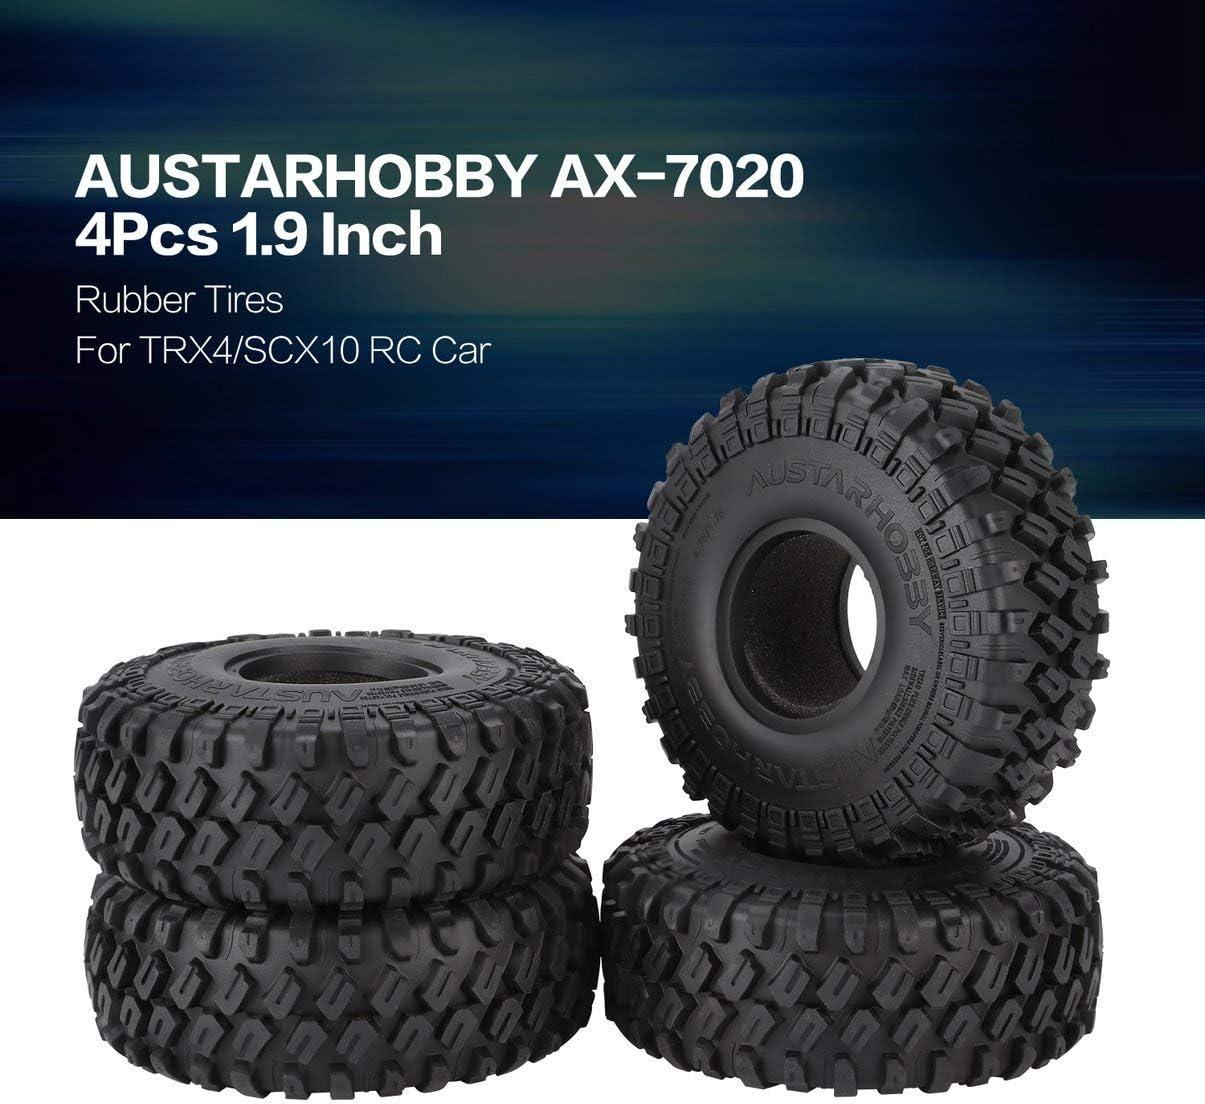 Austarhobby Ax-7020 4Pcs 1.9 Inch 122Mm 1//10 Rock Crawler Rubber Tires For D90 Trx4 Scx10 Axial Tf2 RC Car Accessories